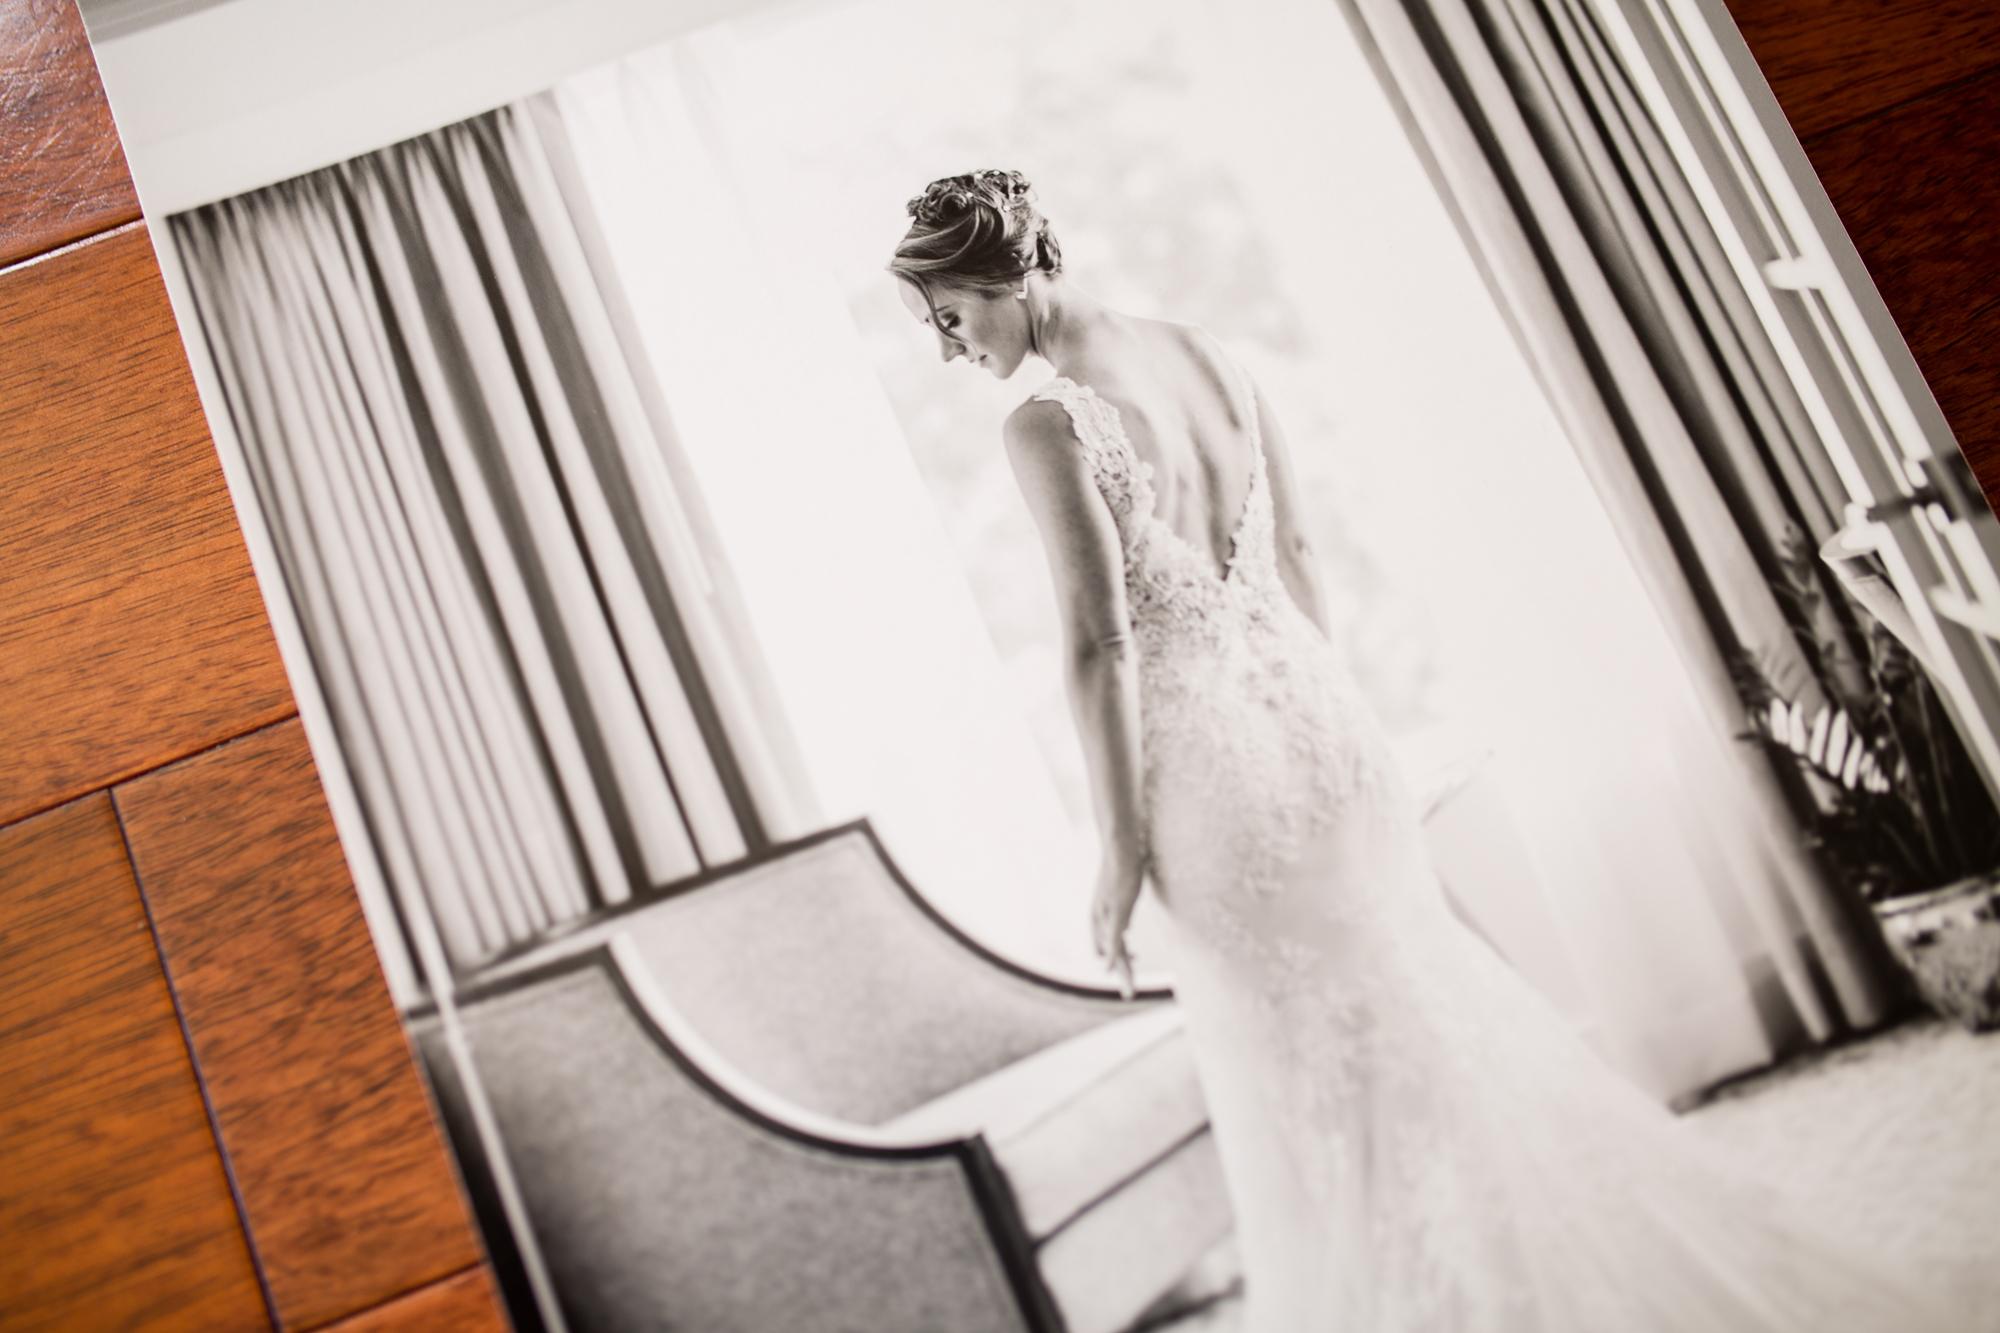 003-los-angeles-wedding-photography-todd-danforth.jpg